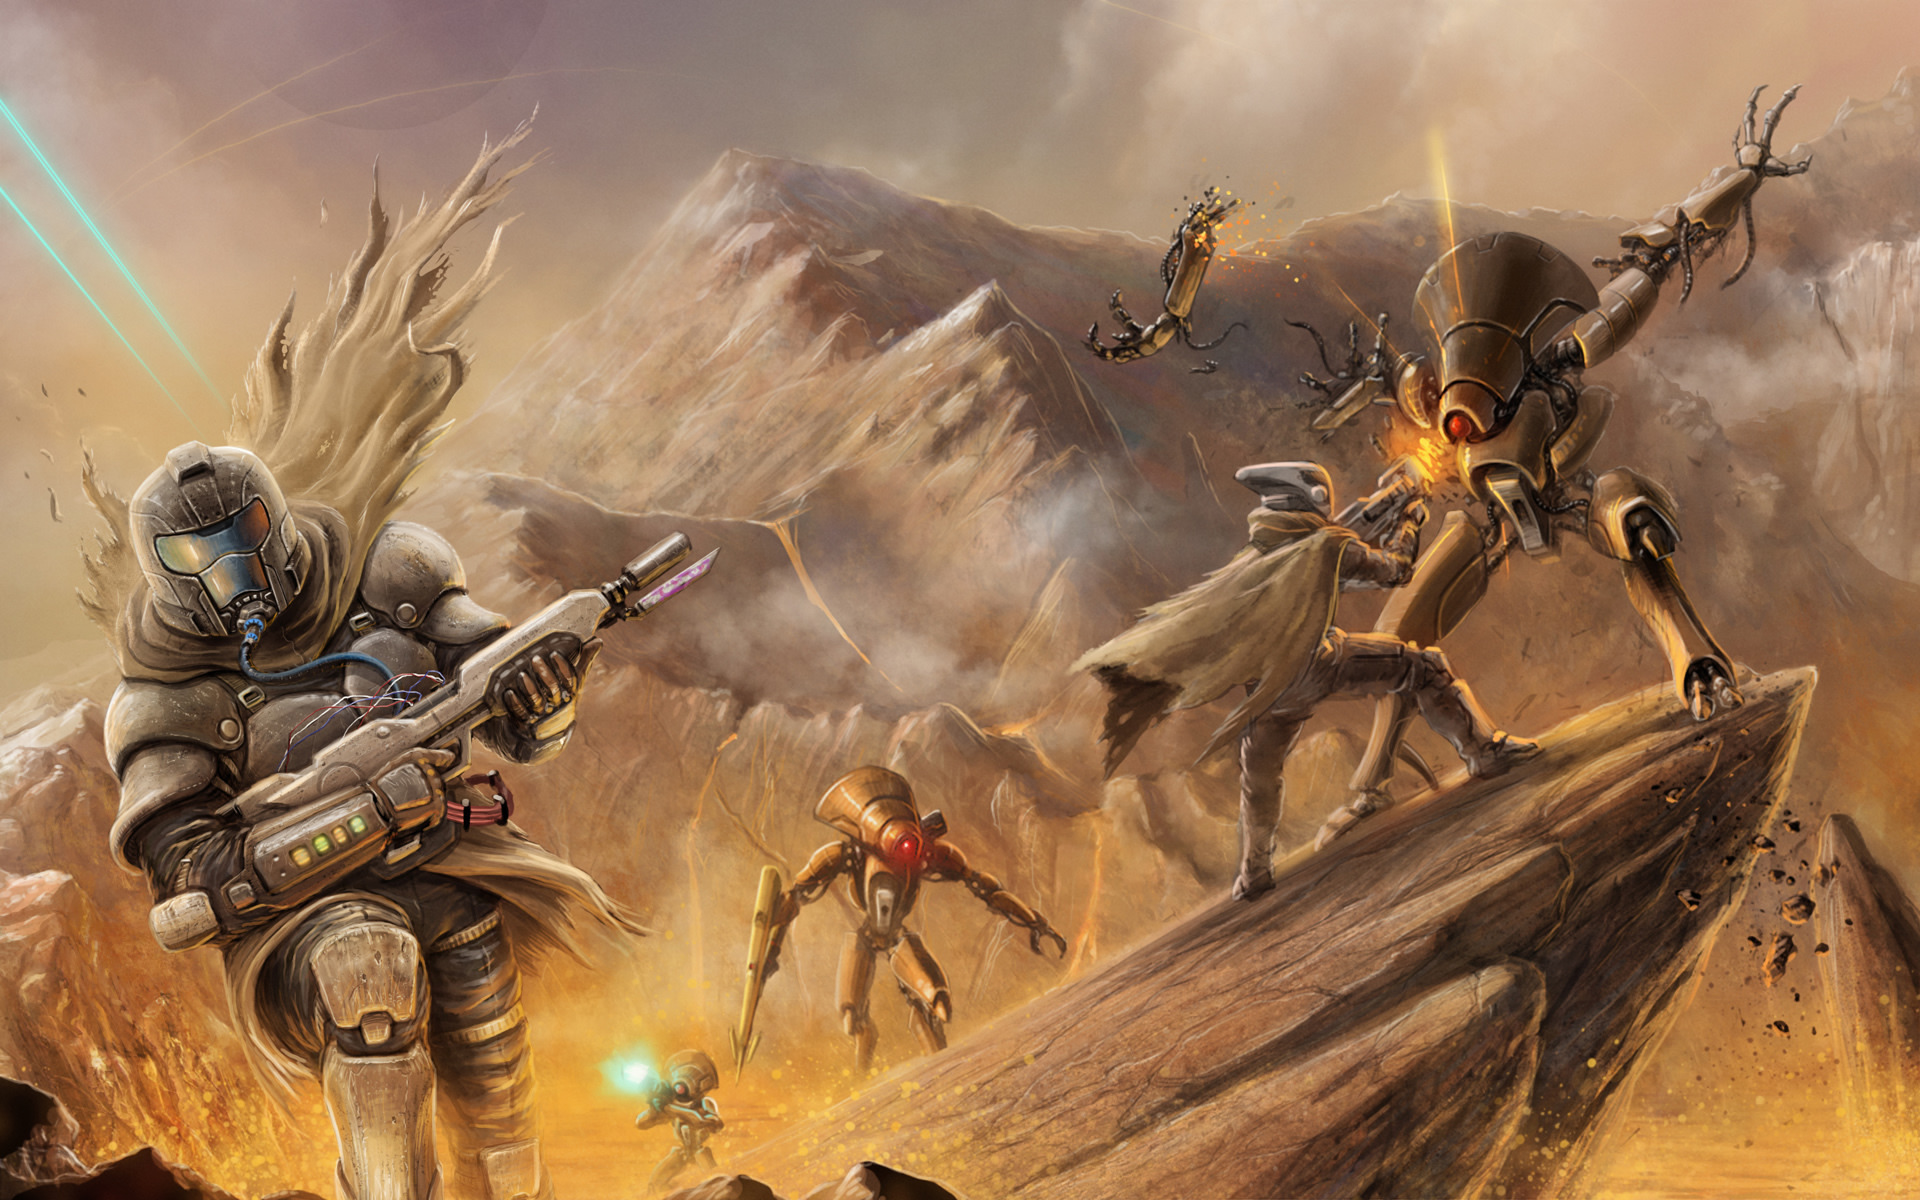 fi weapons battle monsters creature robot mecha wallpaper background 1920x1200